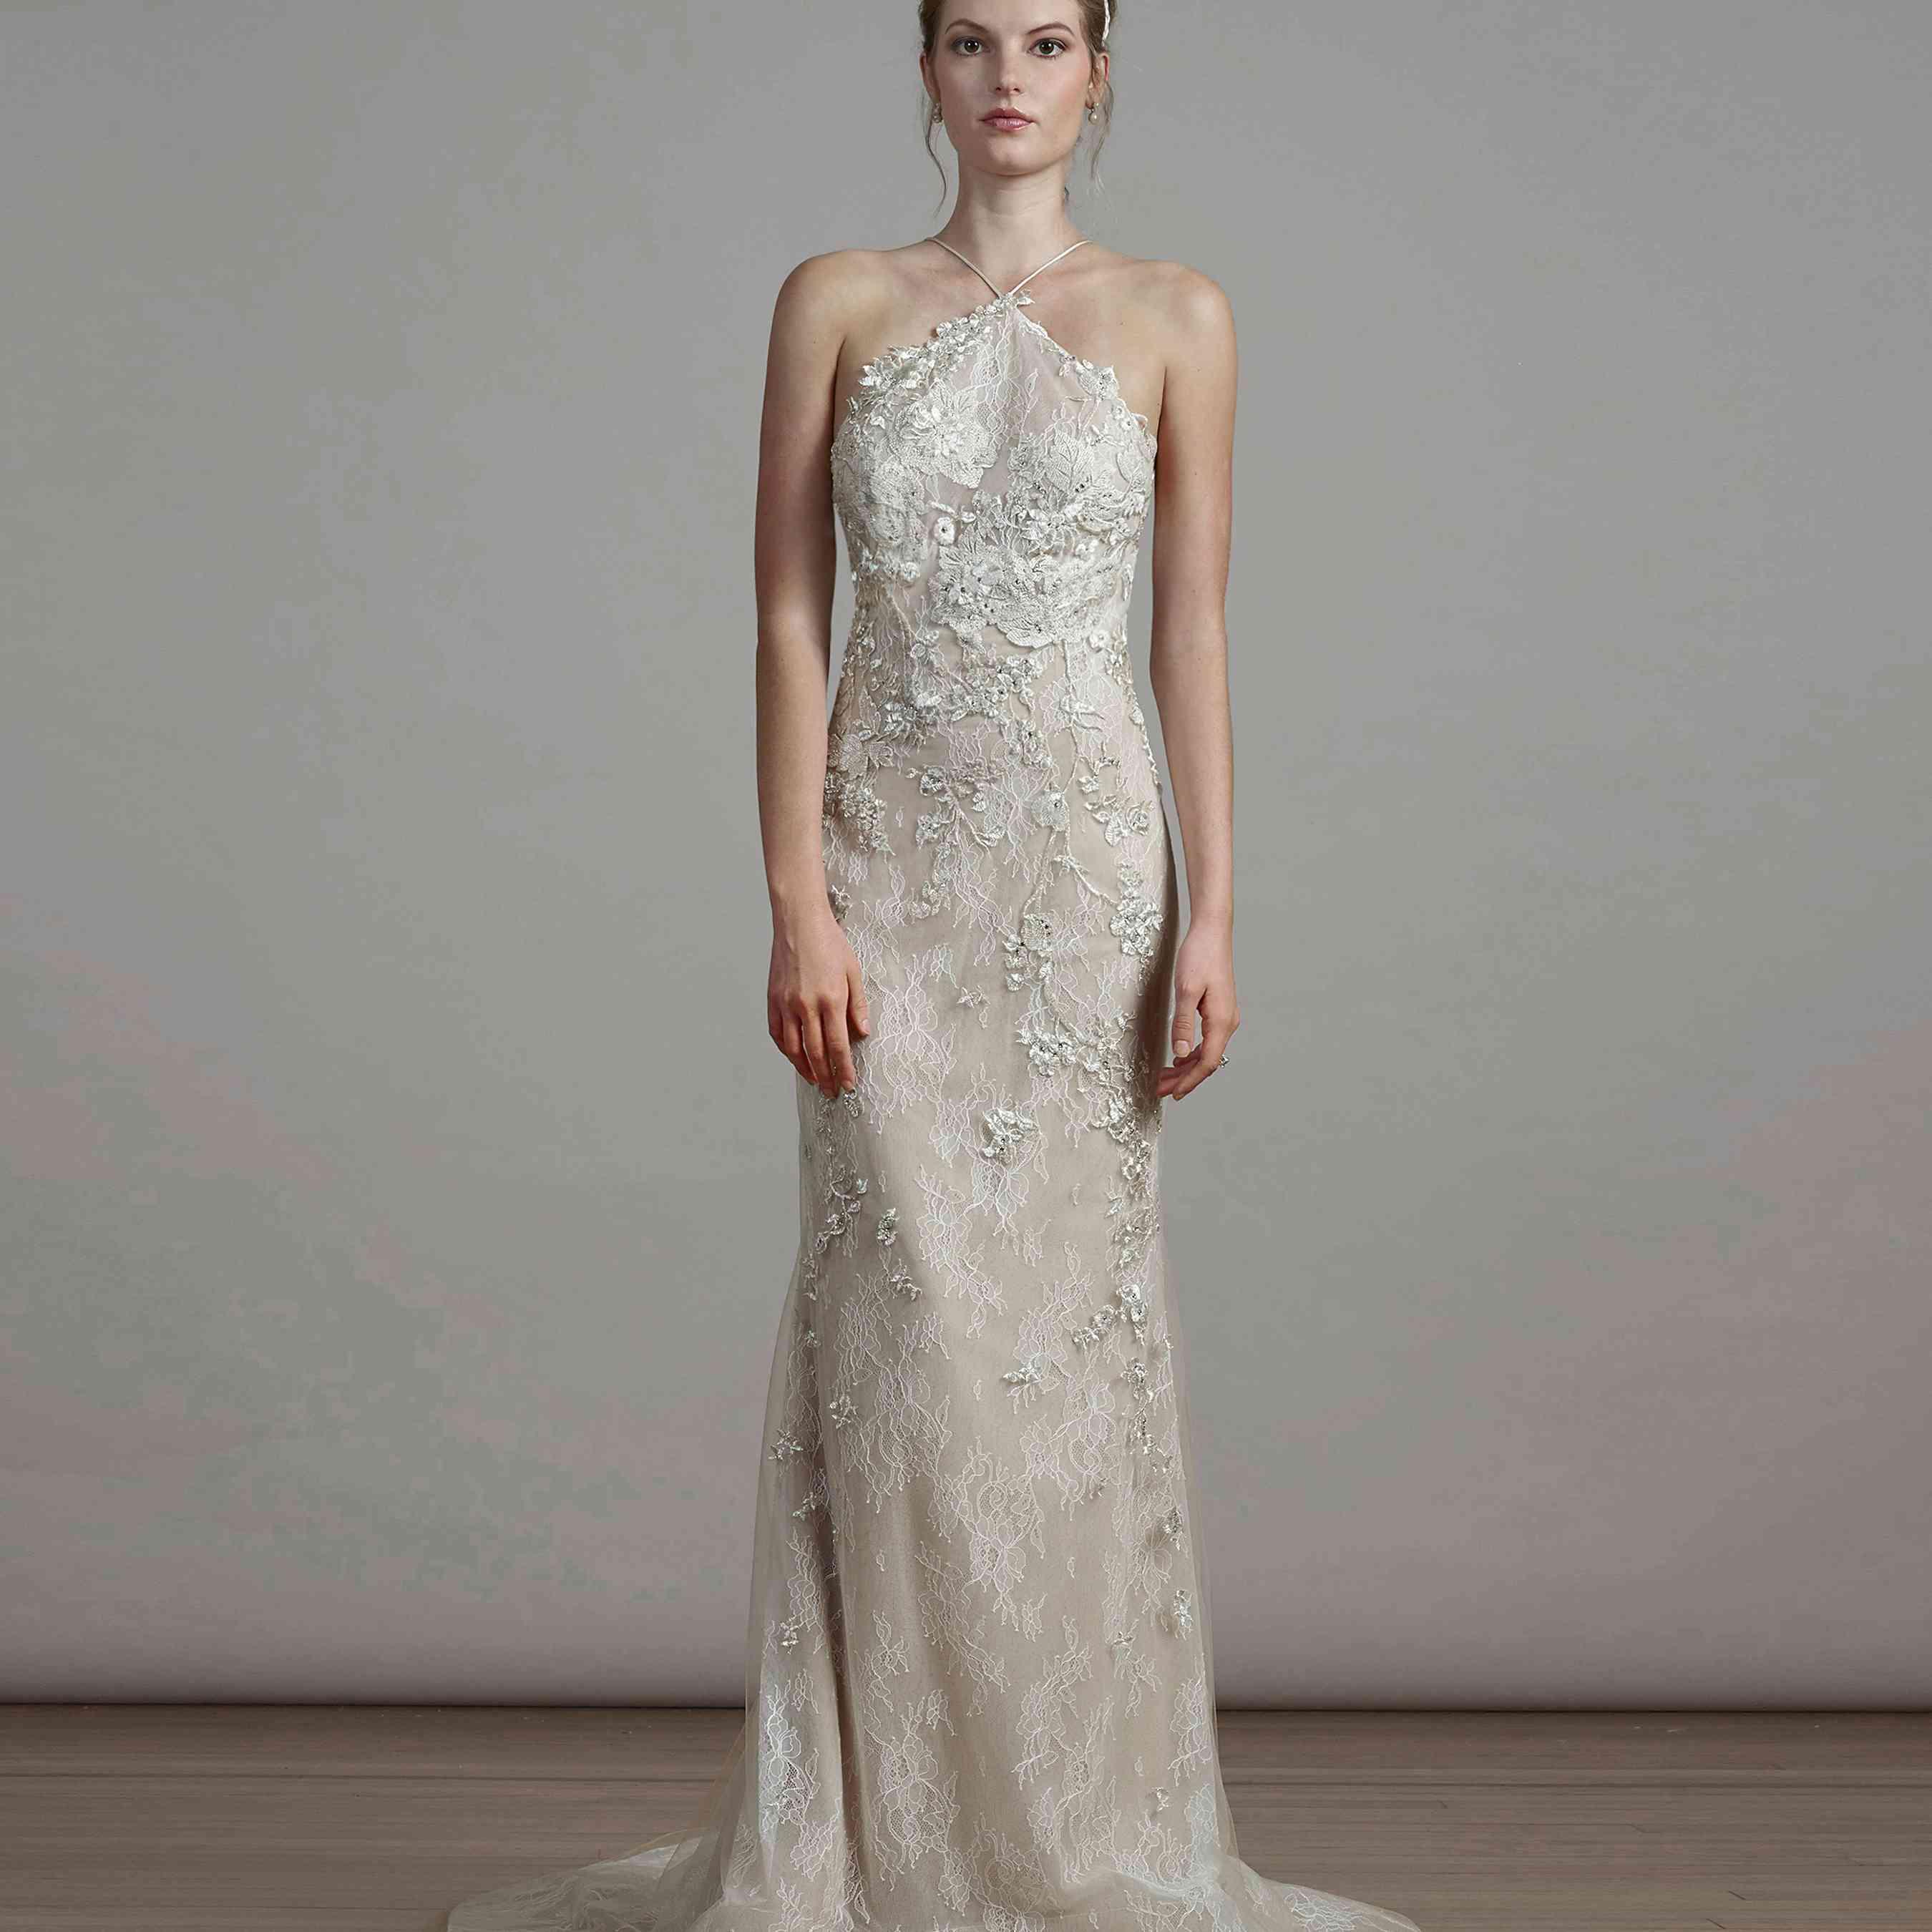 100 Wedding Dresses Perfect For Petite Figures